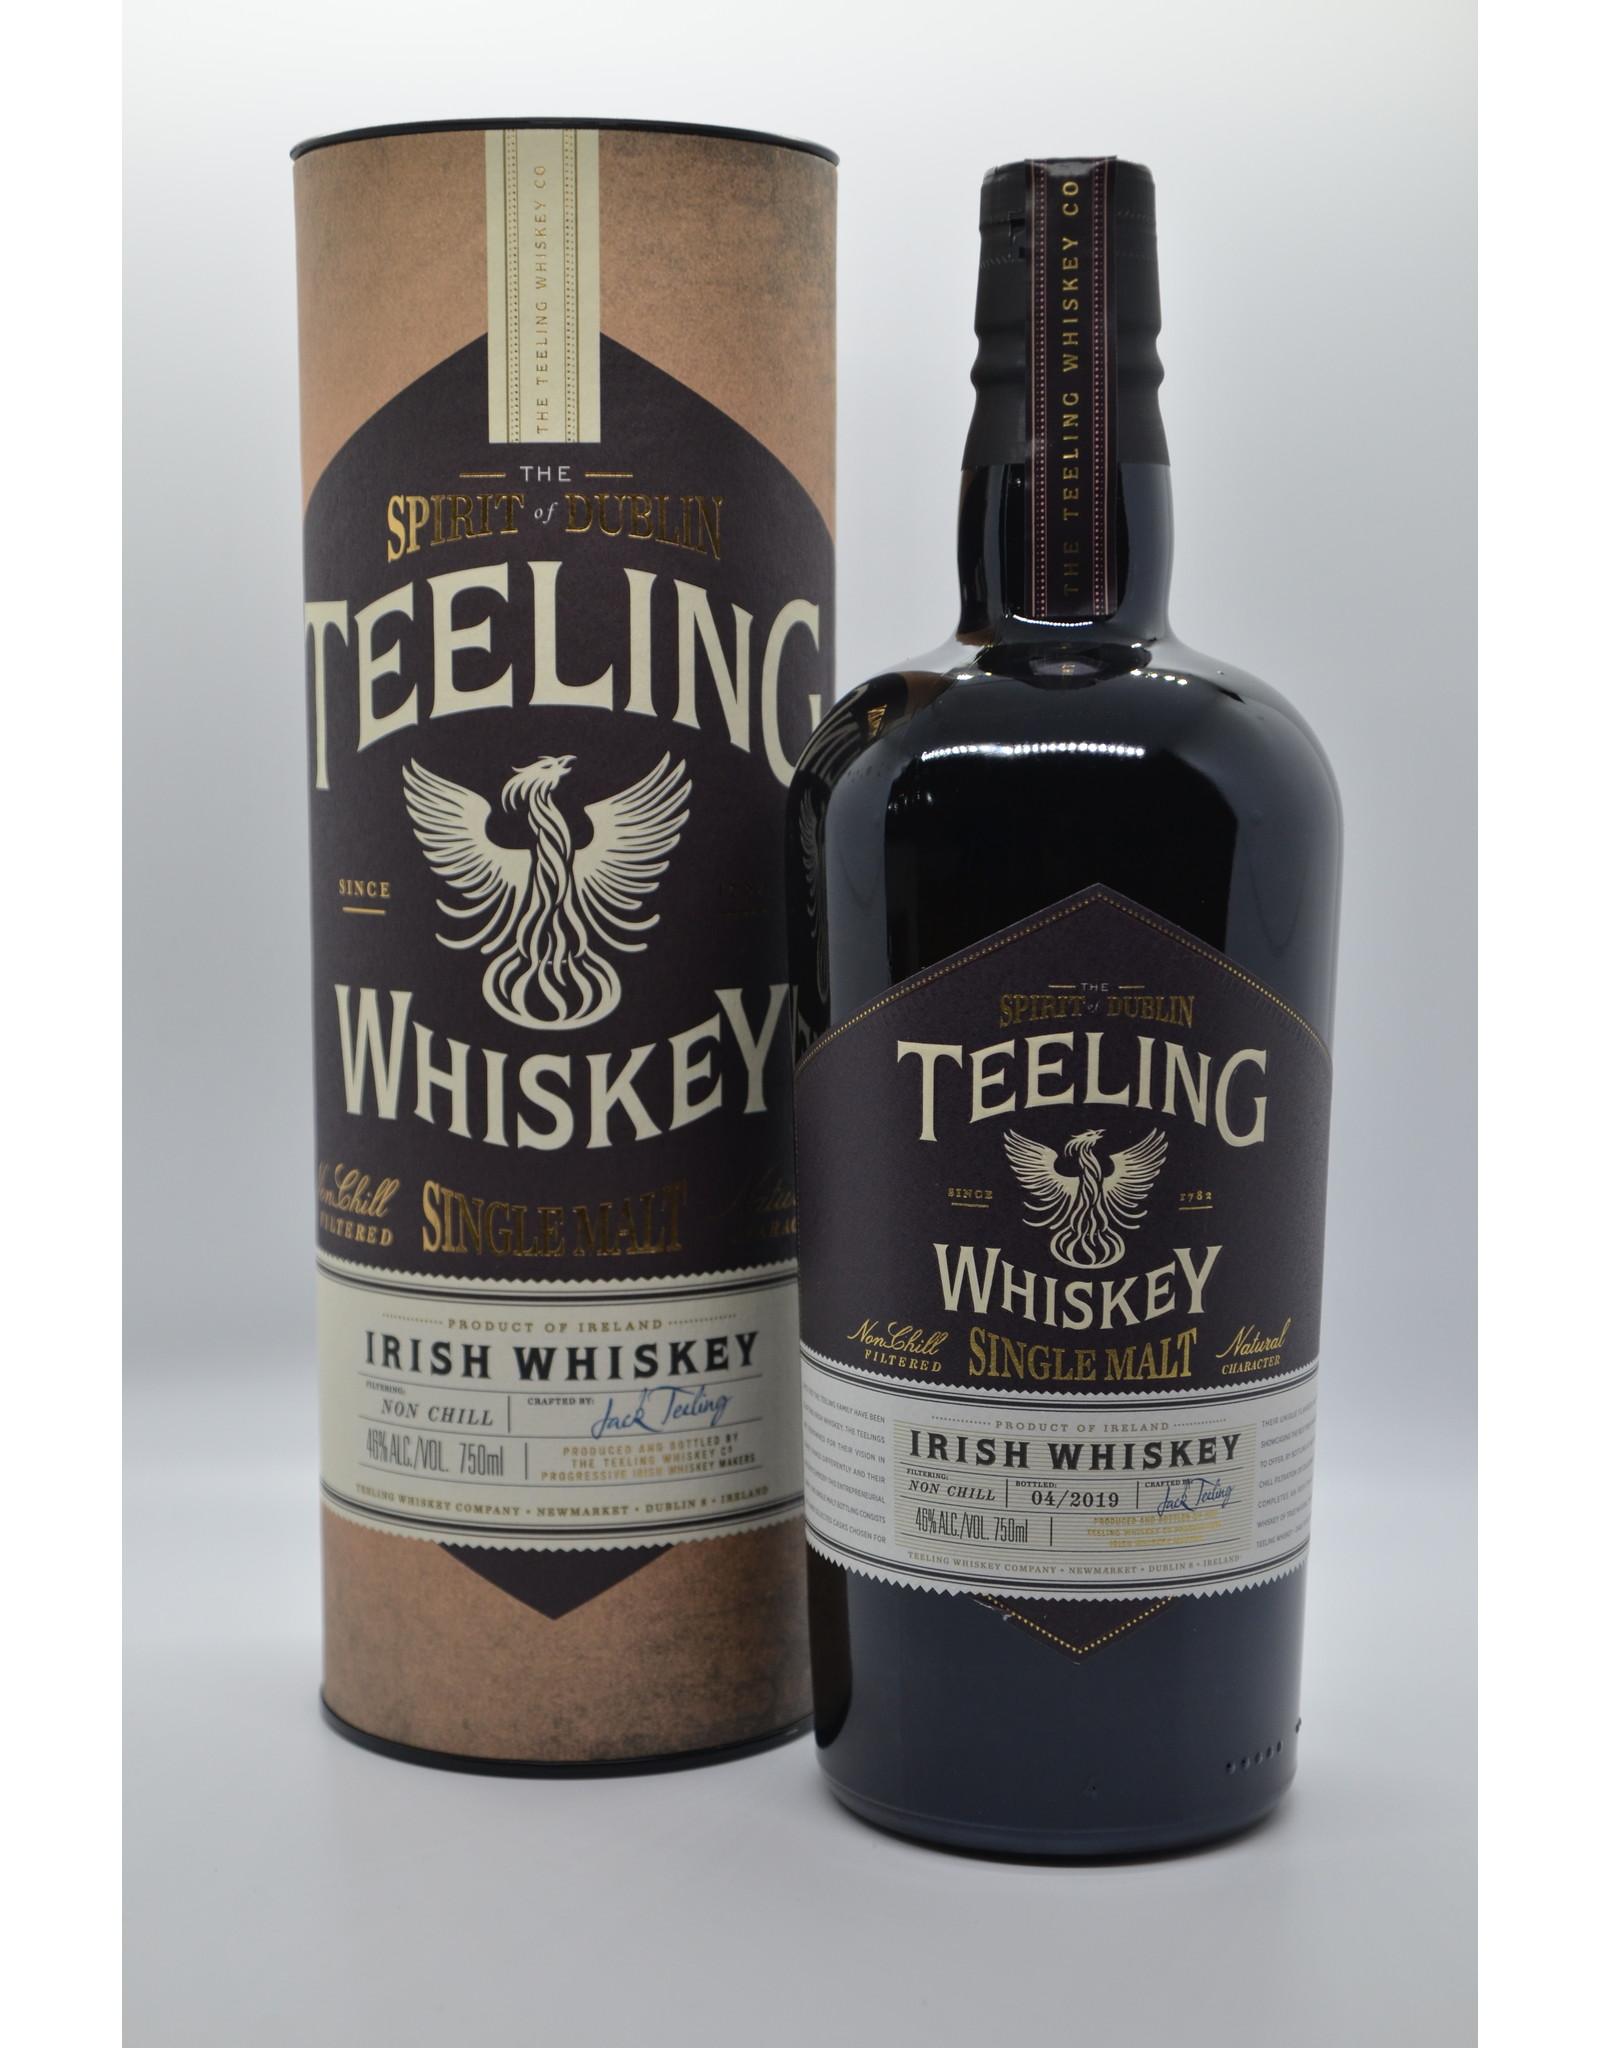 Ireland Teeling Whiskey Single Malt